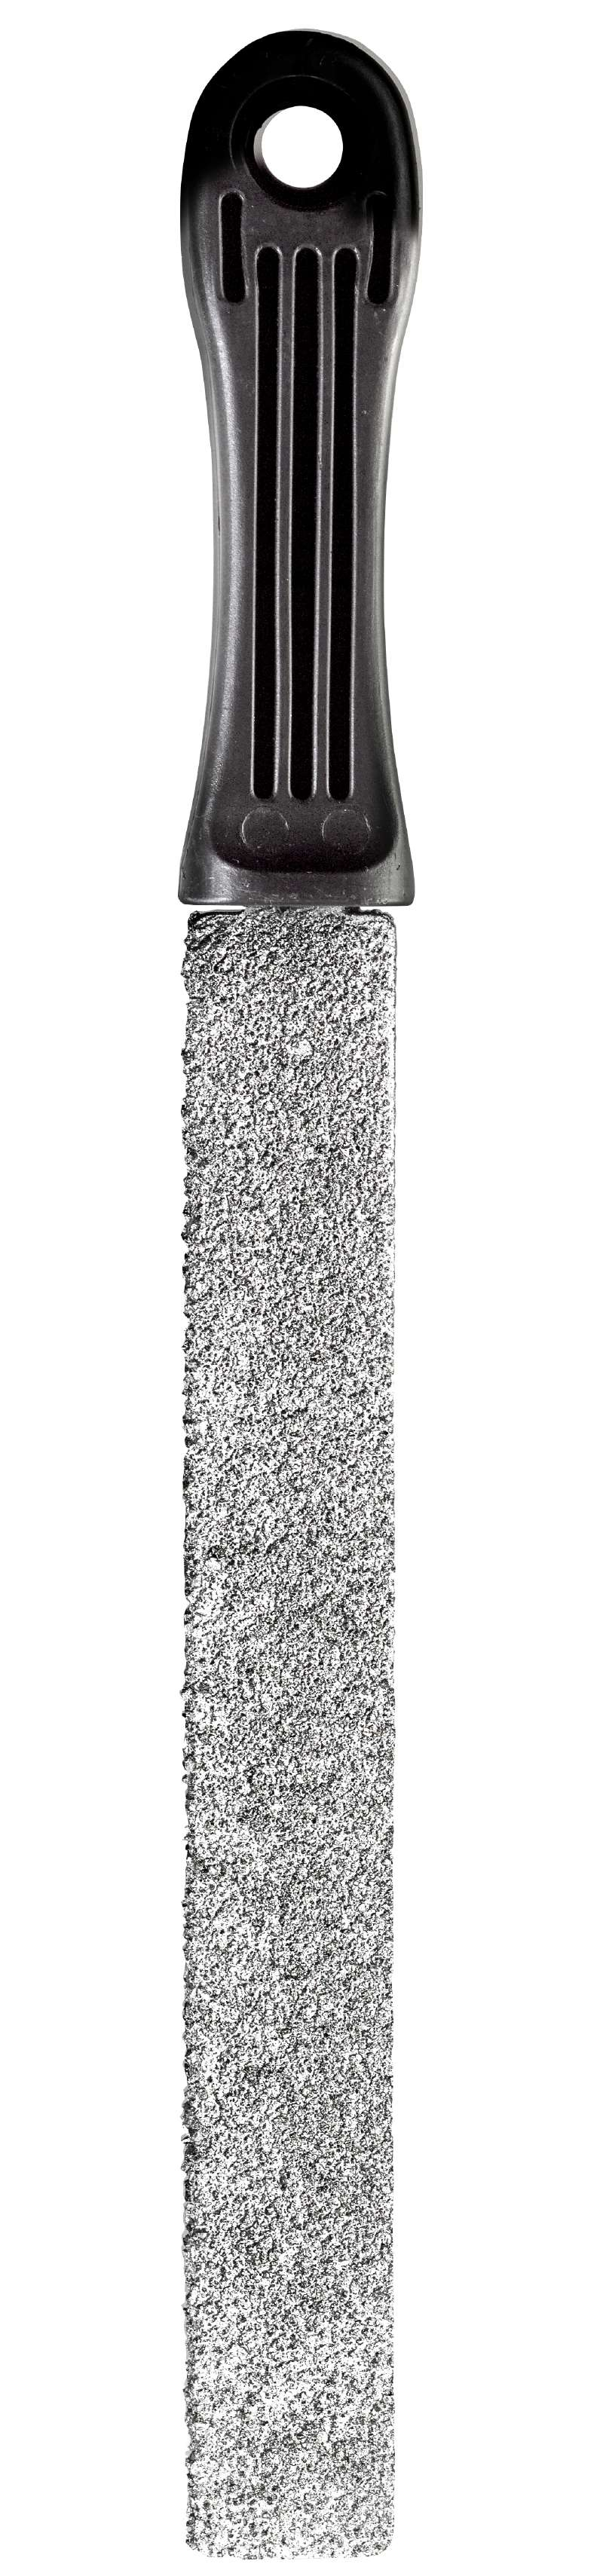 Напильник по металлу Kwb